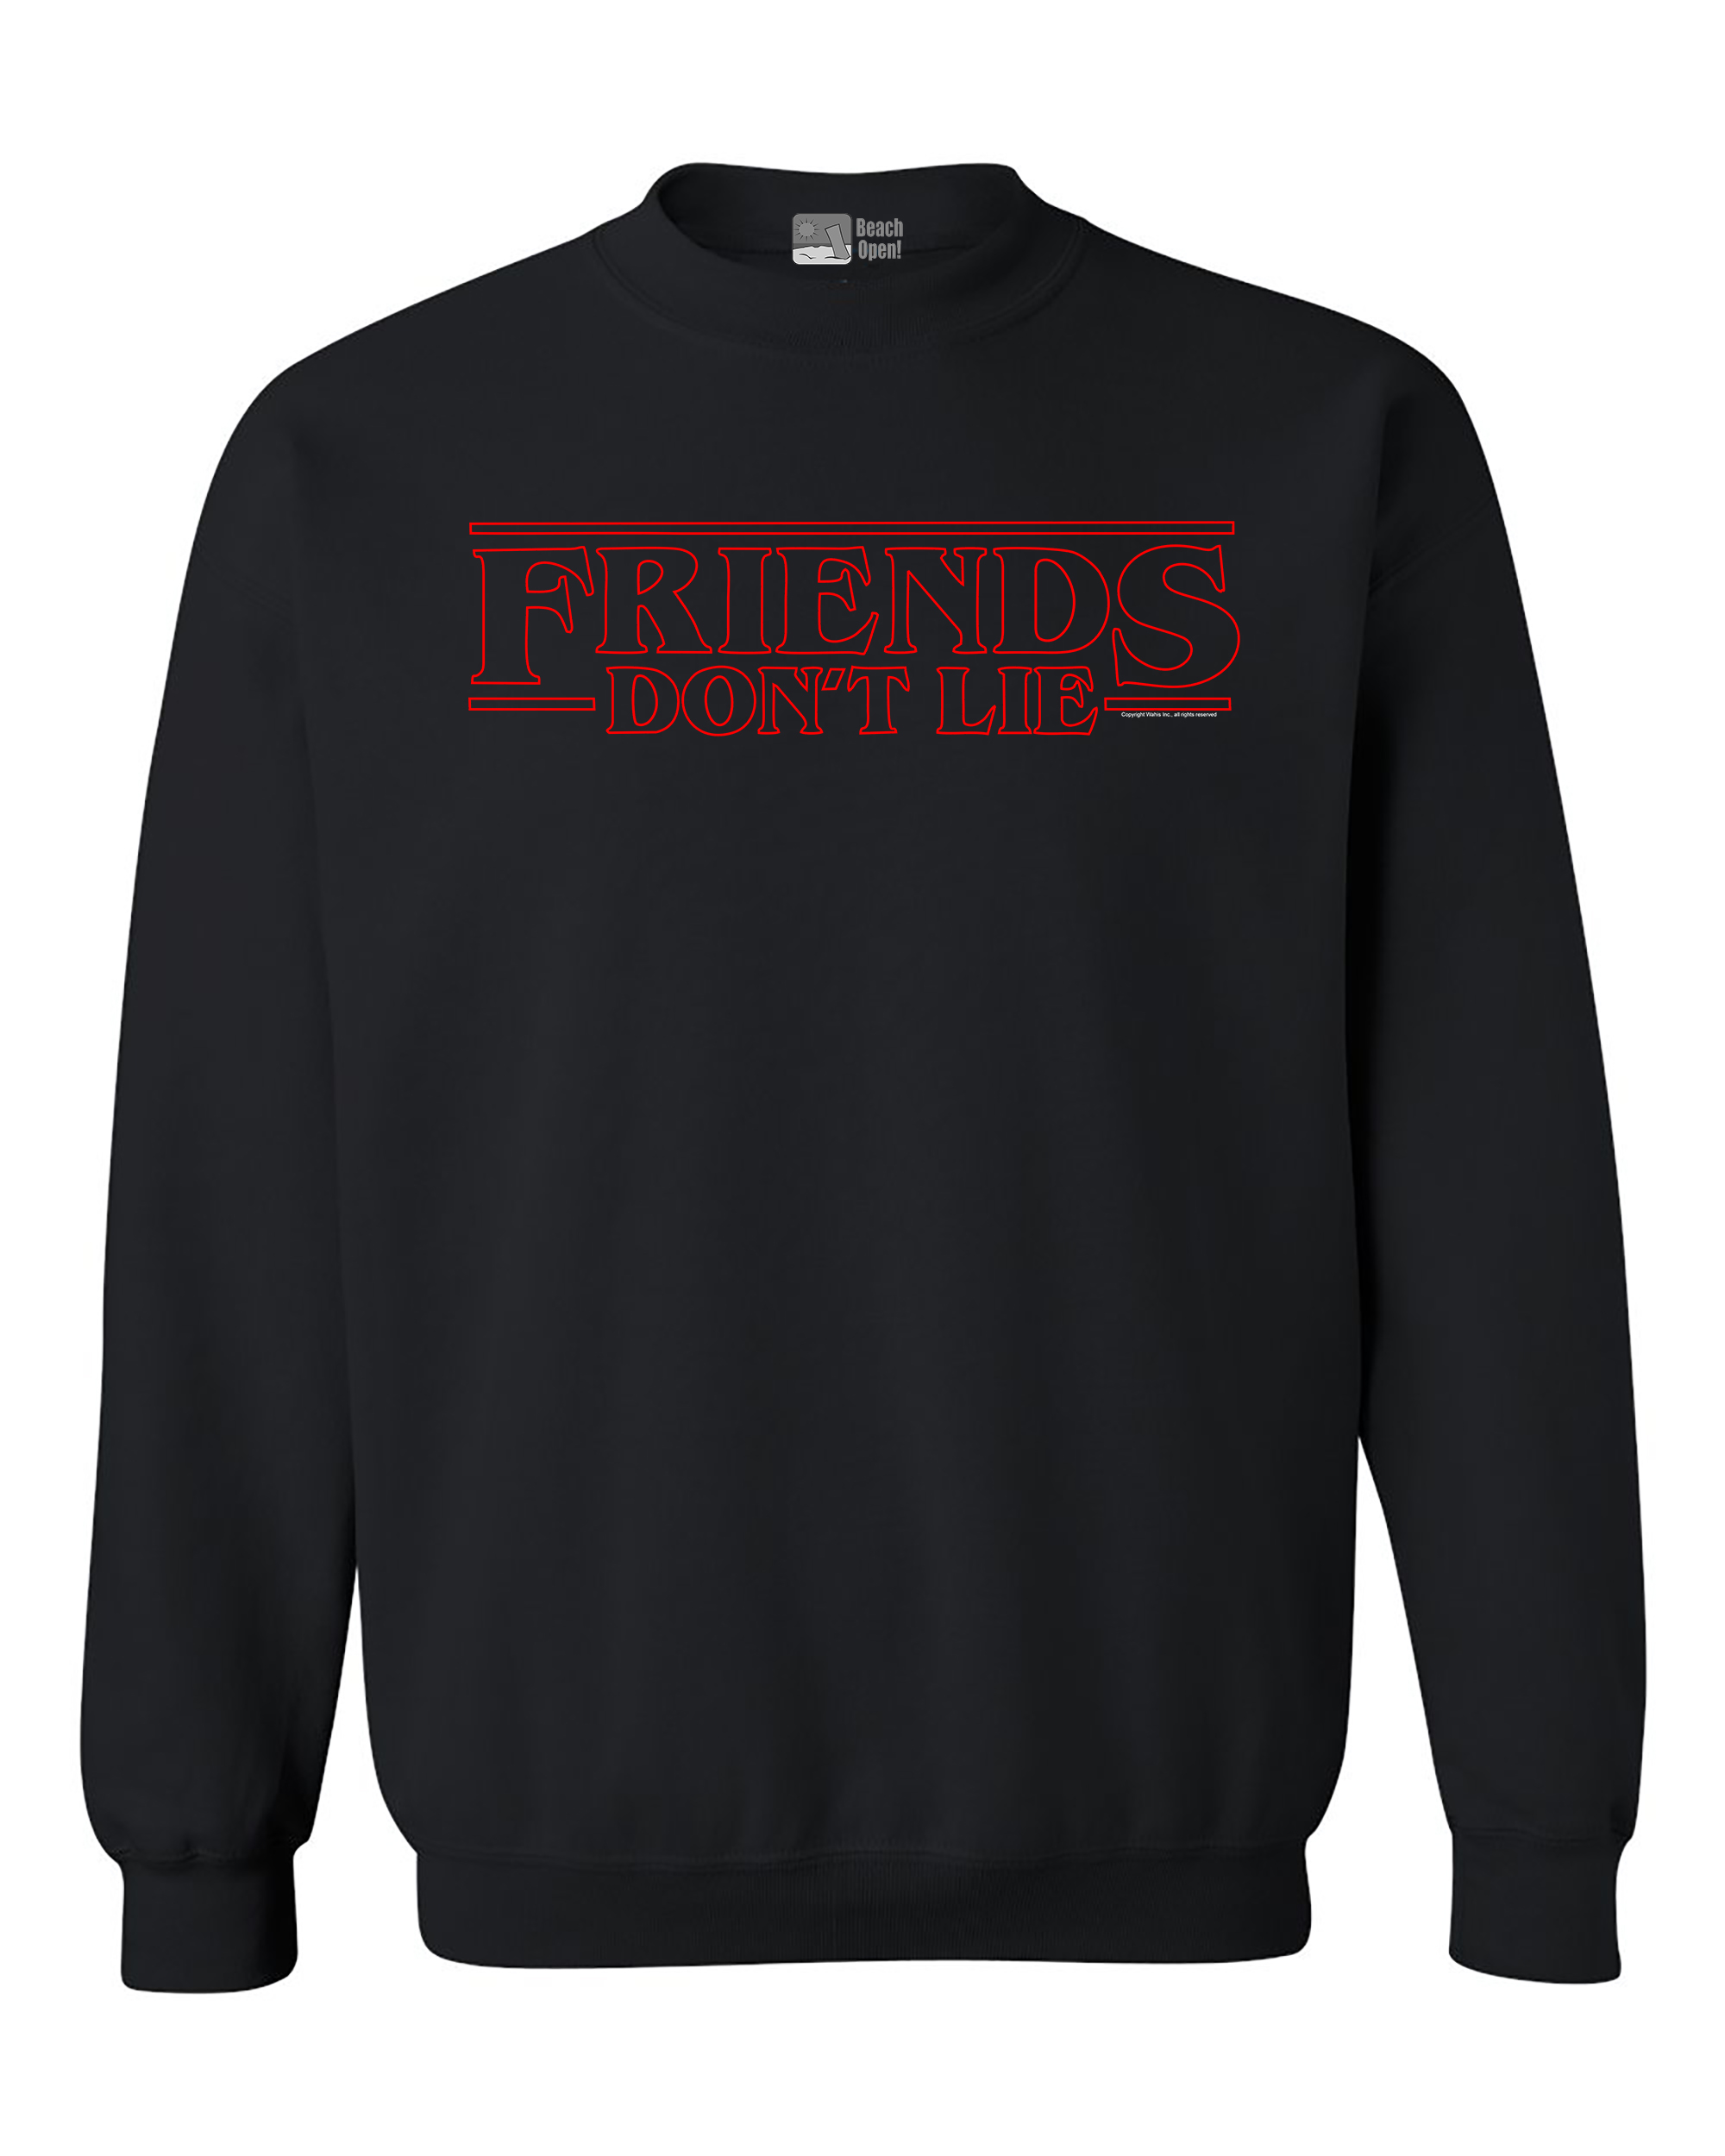 Friends Don't Lie Quote Holiday Supernatural Horror Parody Funny DT Crewneck Sweatshirt